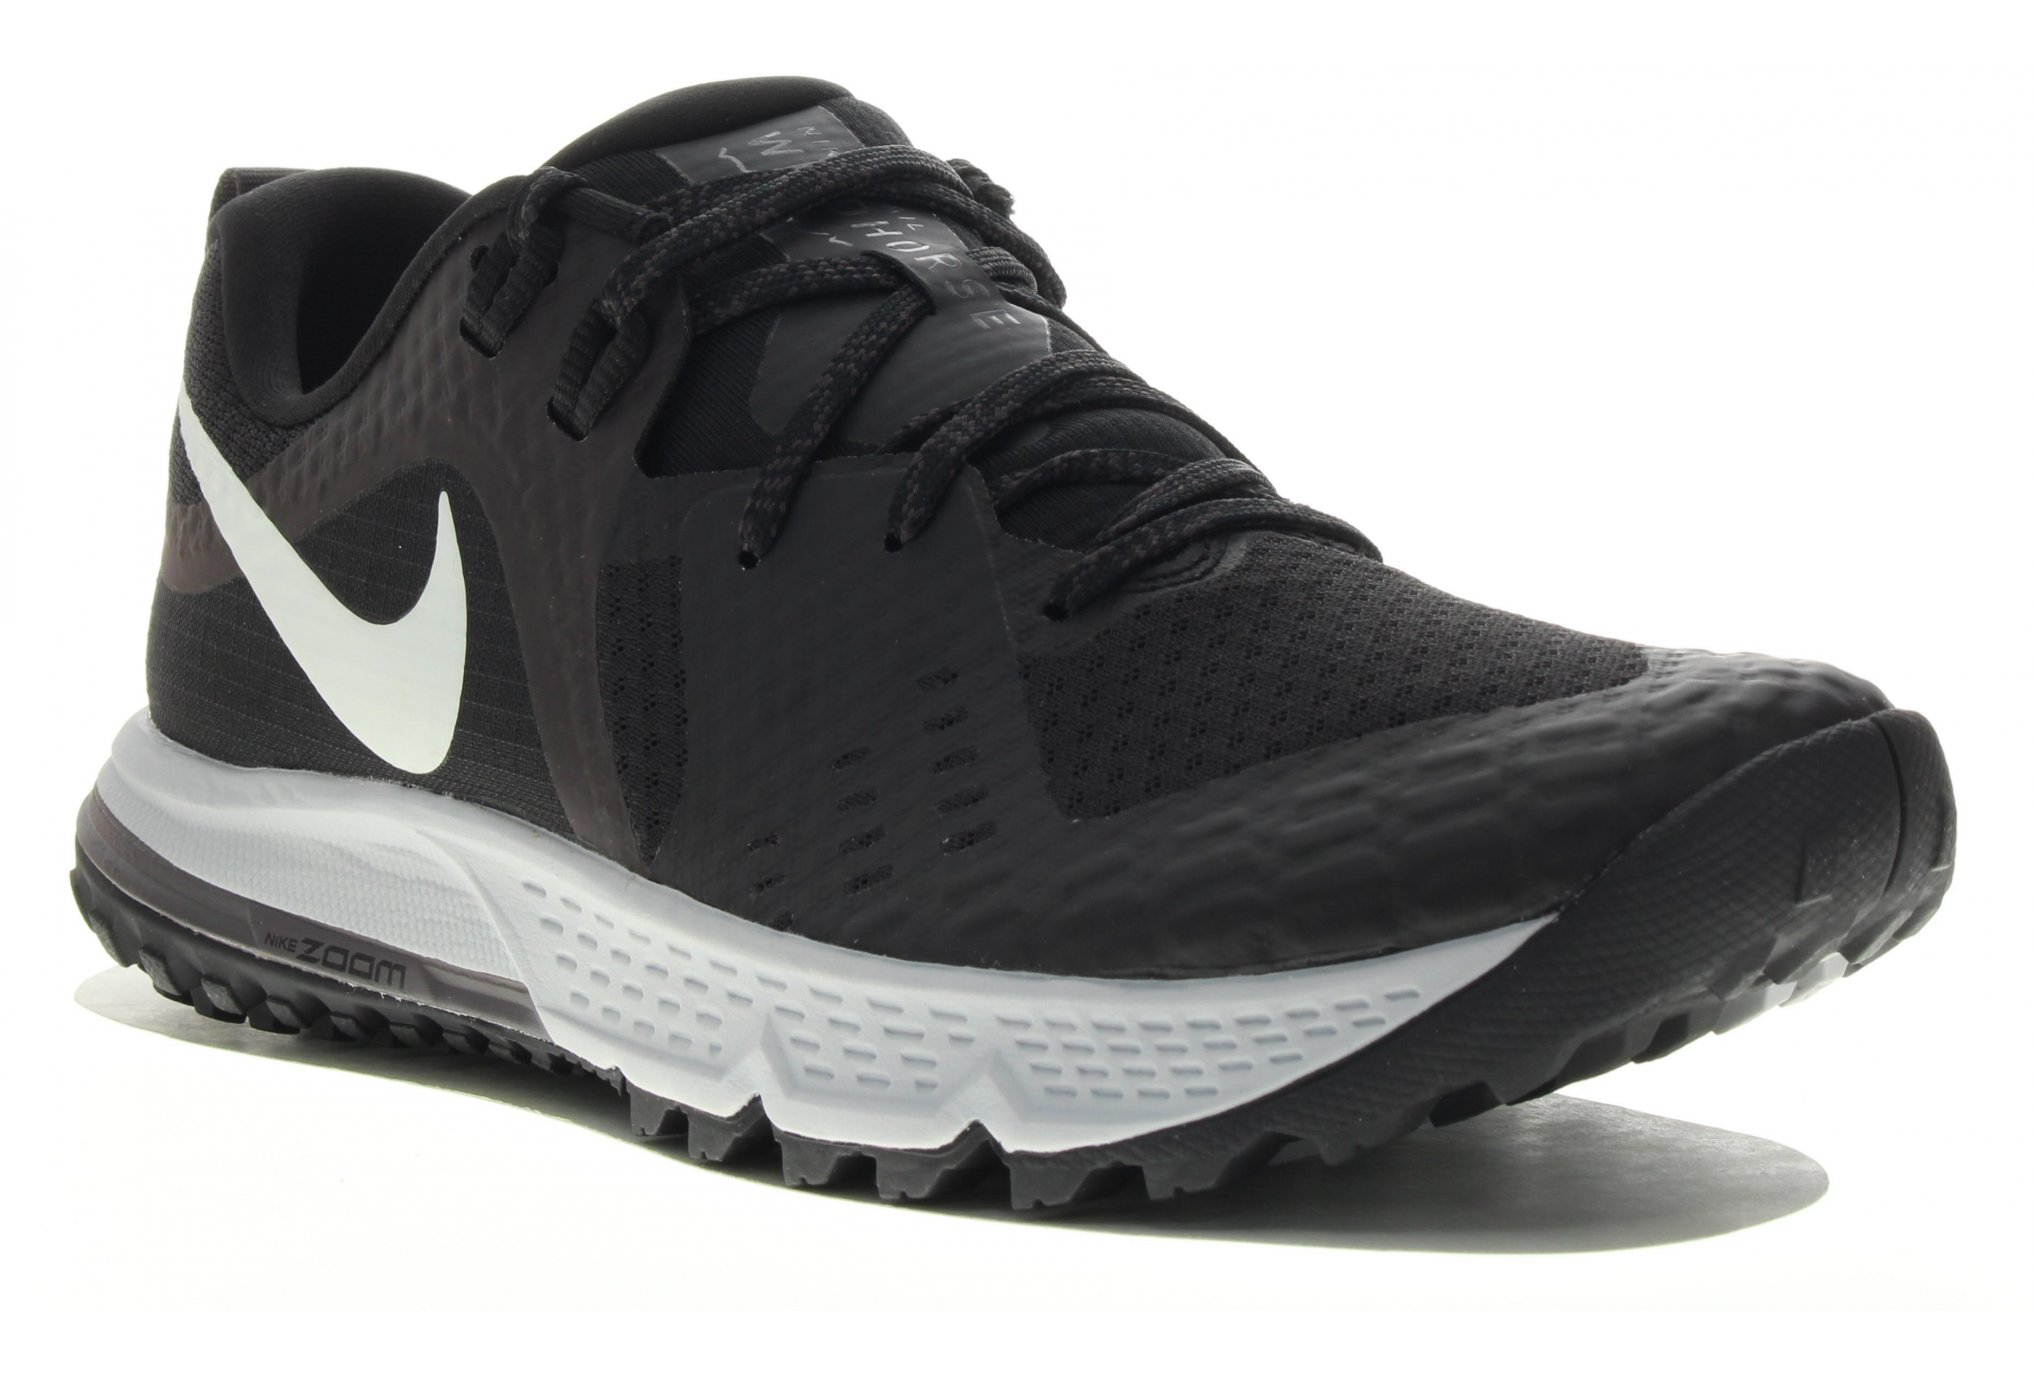 Nike Air Zoom Wildhorse 5 Chaussures running femme